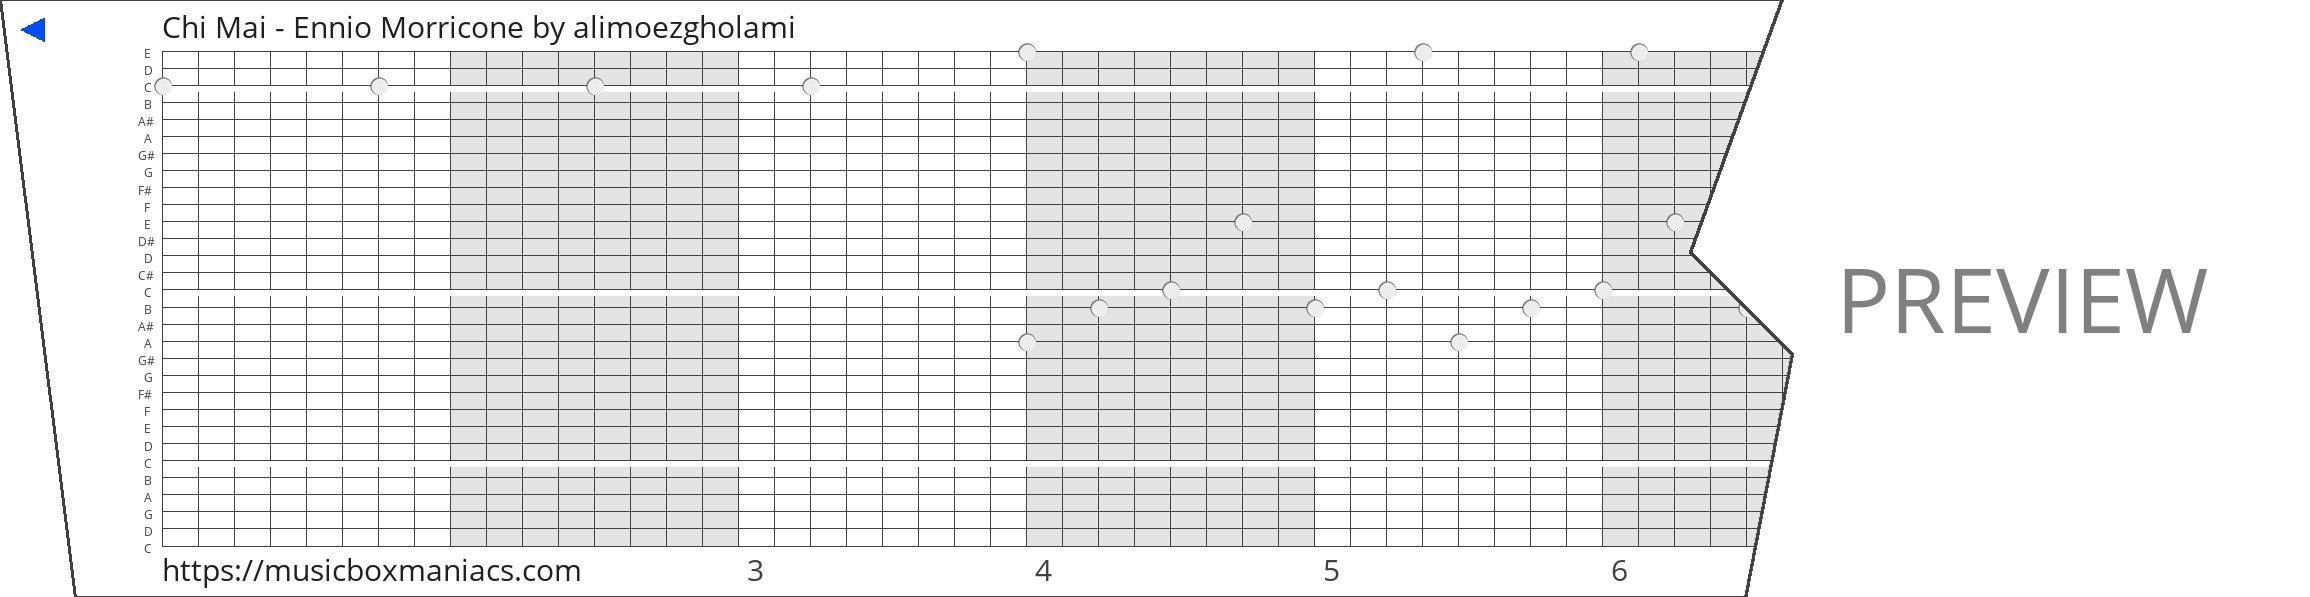 Chi Mai - Ennio Morricone 30 note music box paper strip